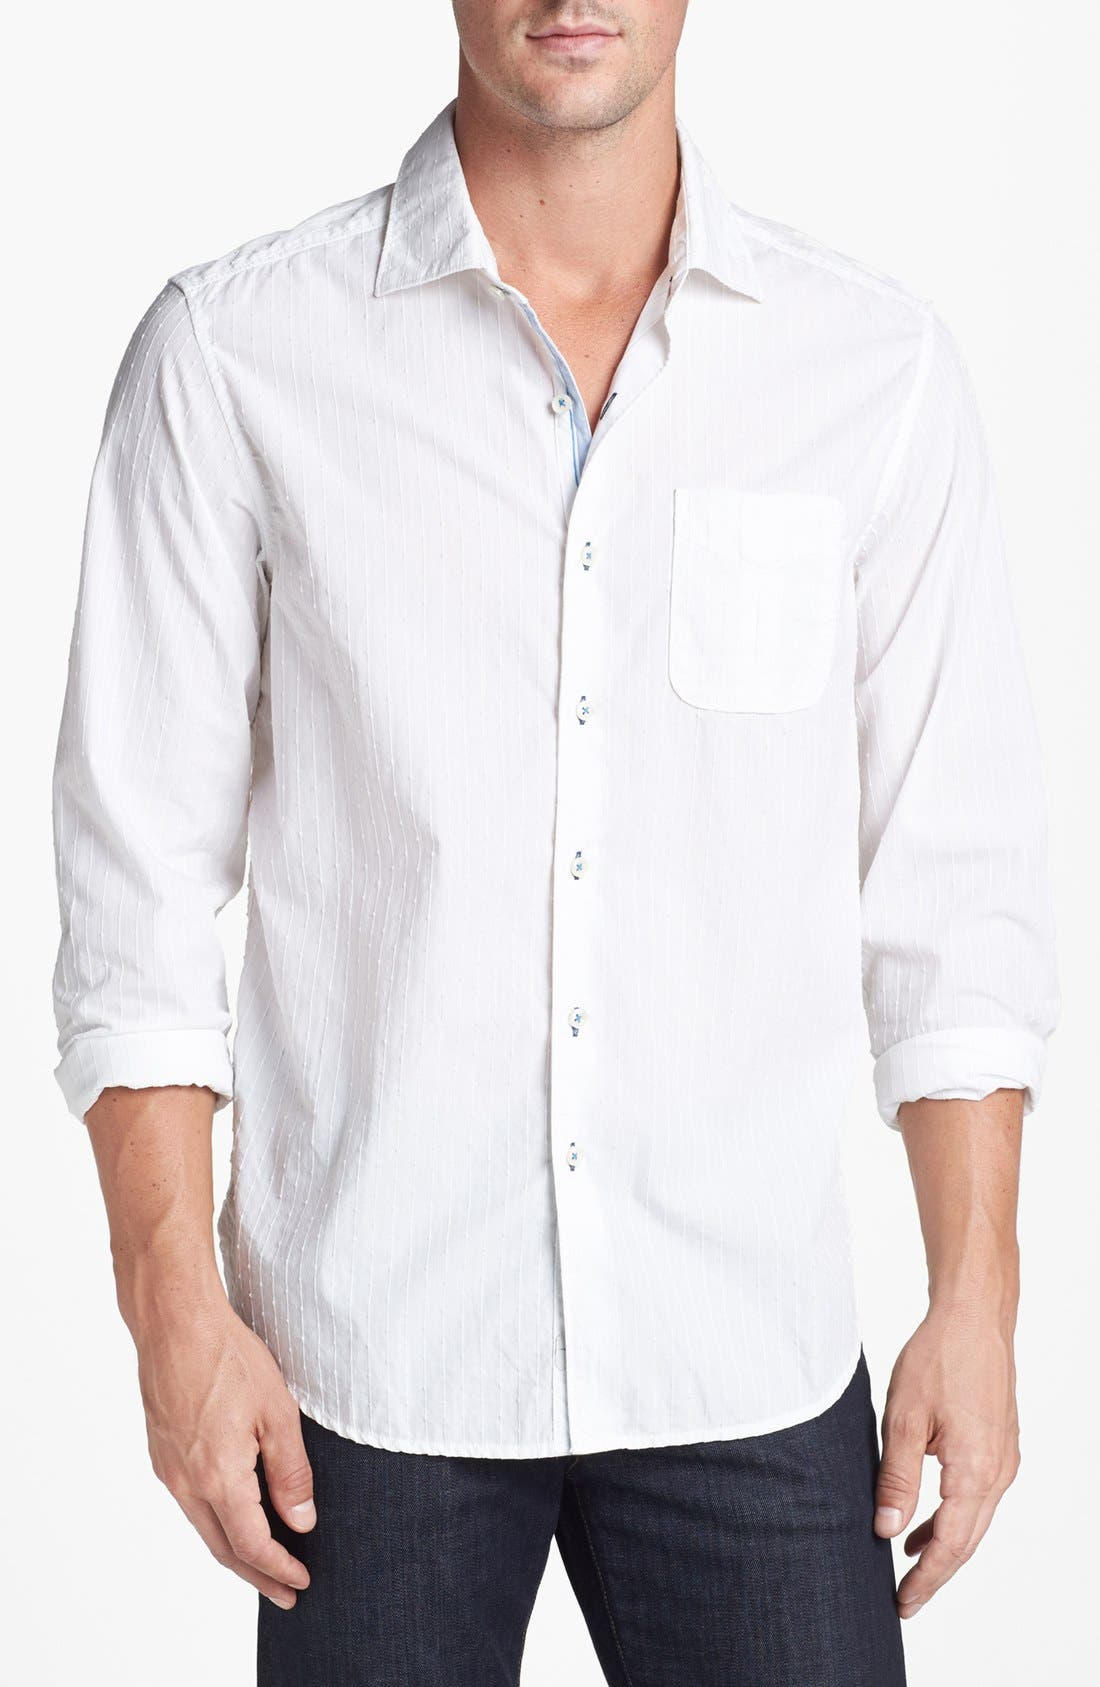 Alternate Image 1 Selected - Tommy Bahama Denim '3 Stripe 'n Seek' Island Modern Fit Sport Shirt